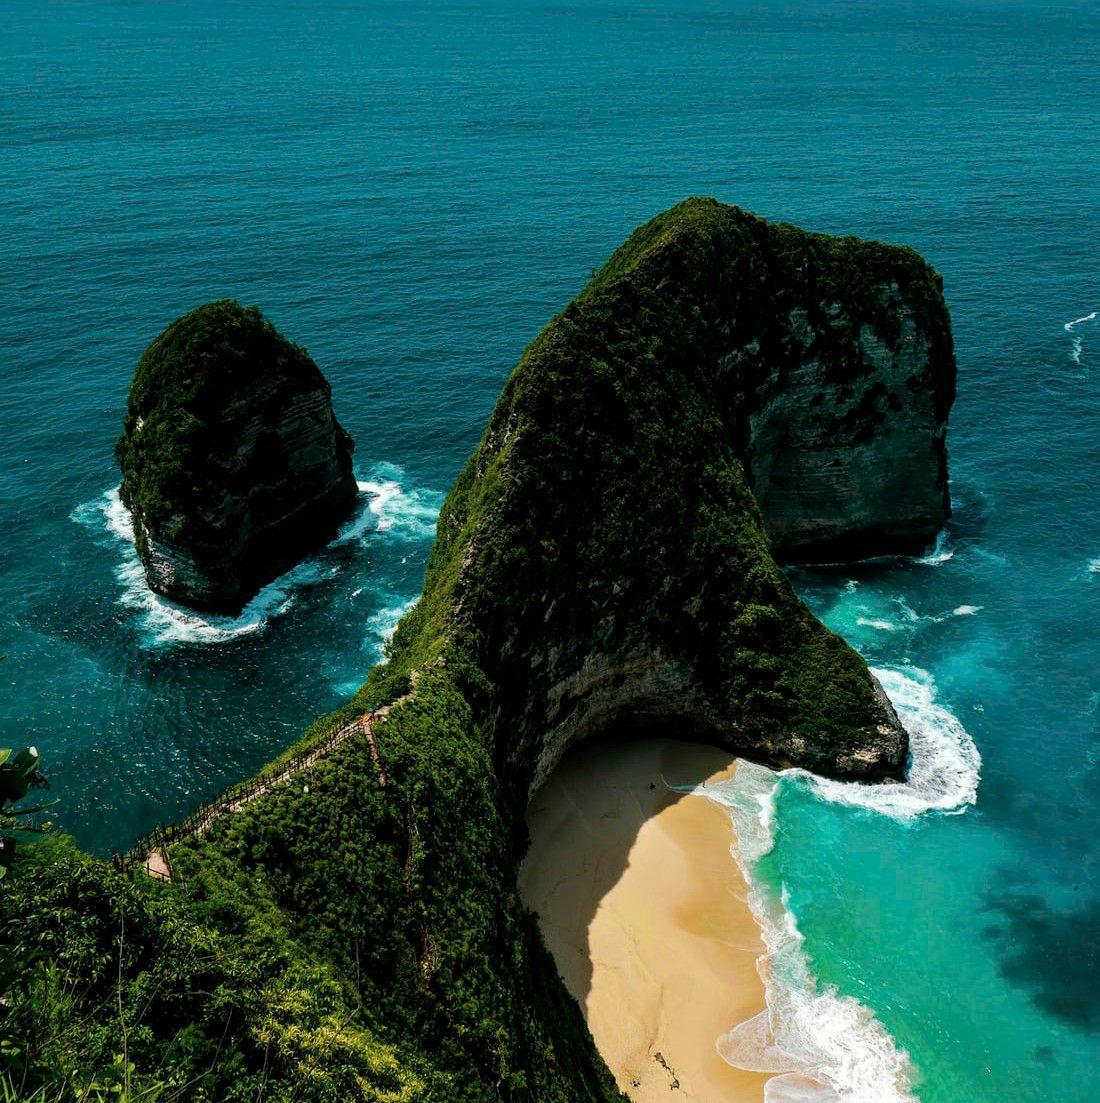 Flüge: Bali / Indonesien ( April-Juni ) Hin- und Rückflug von Frankfurt nach Denpasar ab 474€ inkl. Gepäck